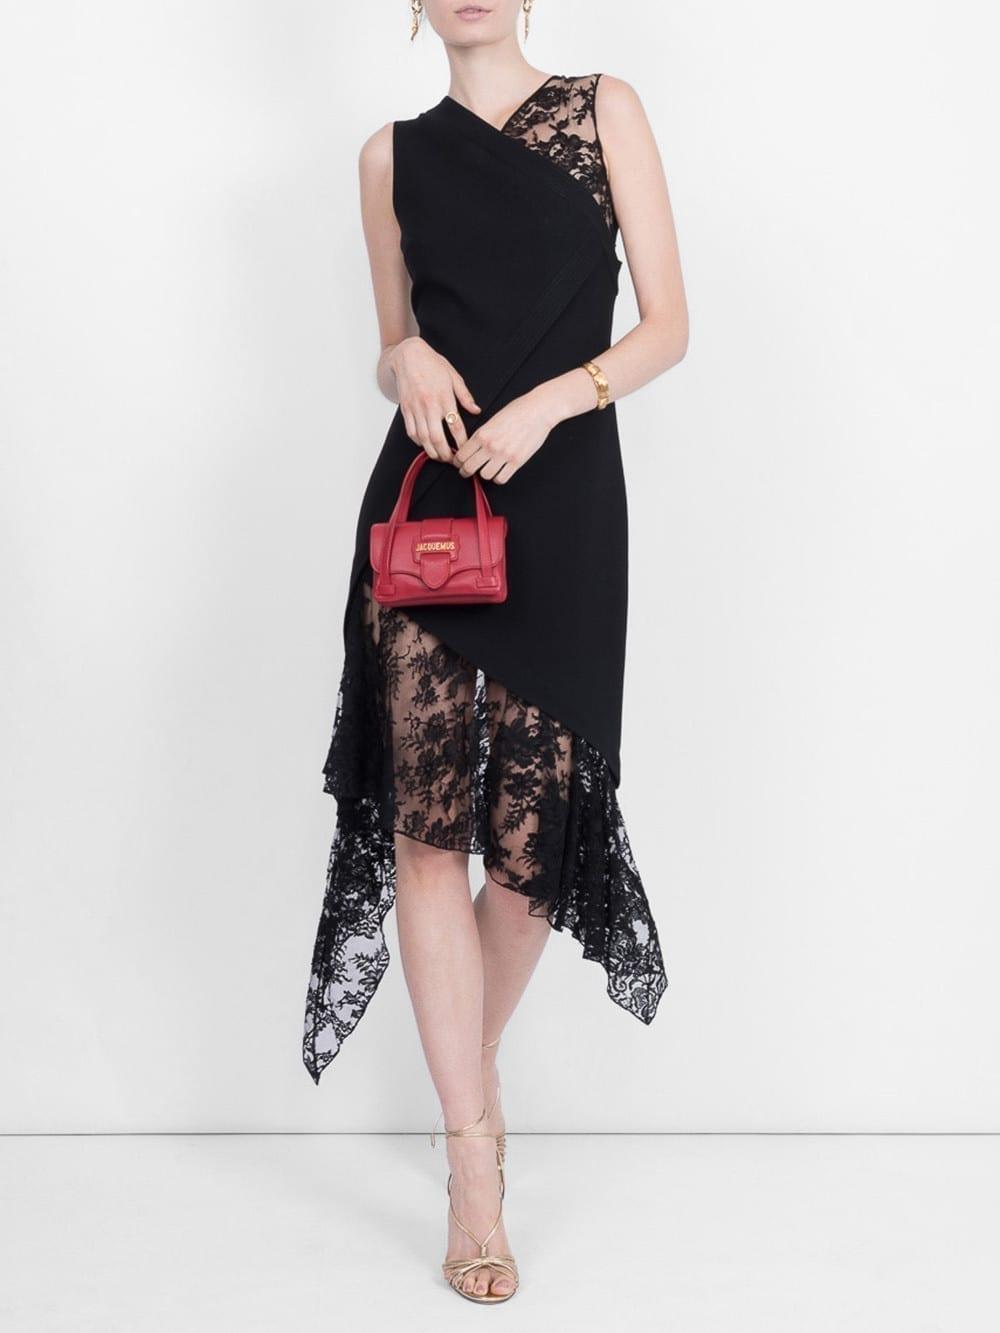 GIVENCHY Assymetrical Black Dress